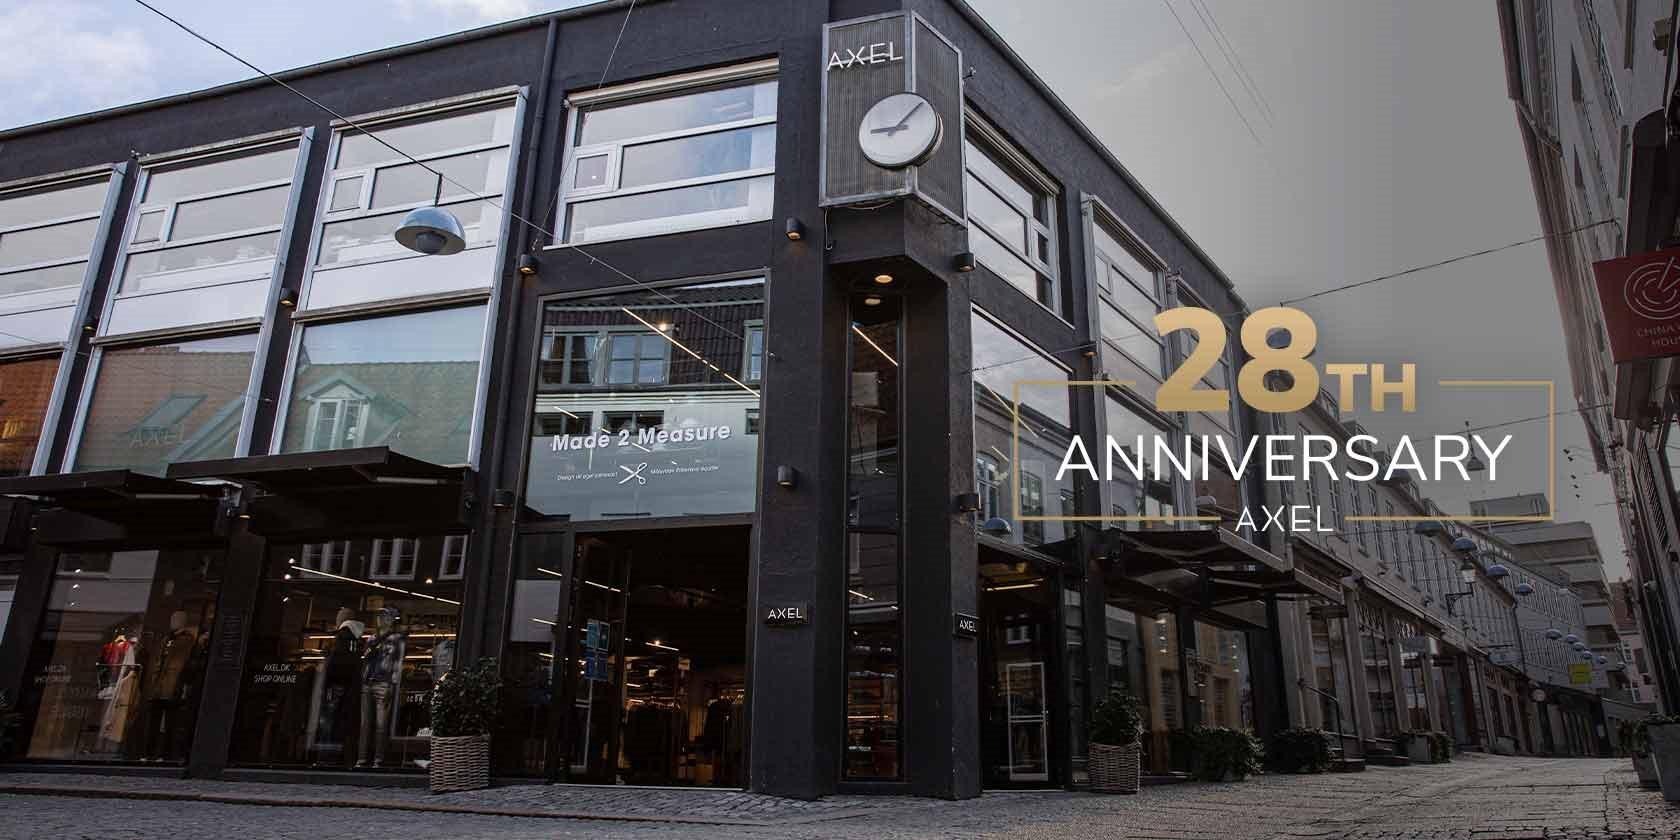 Axel anniversary 28th